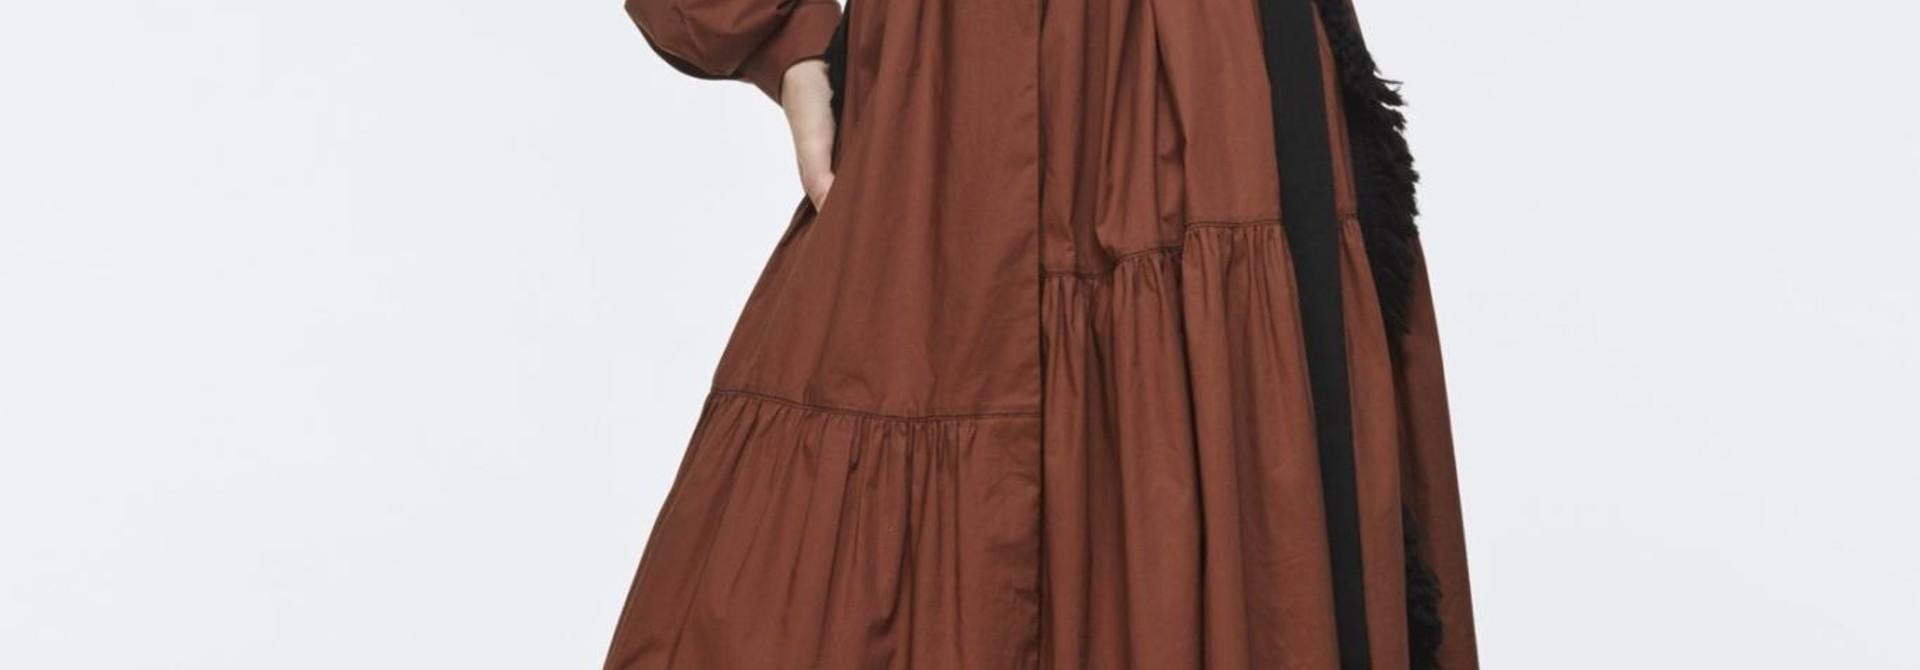 Poplin power dress dorothee schumacher